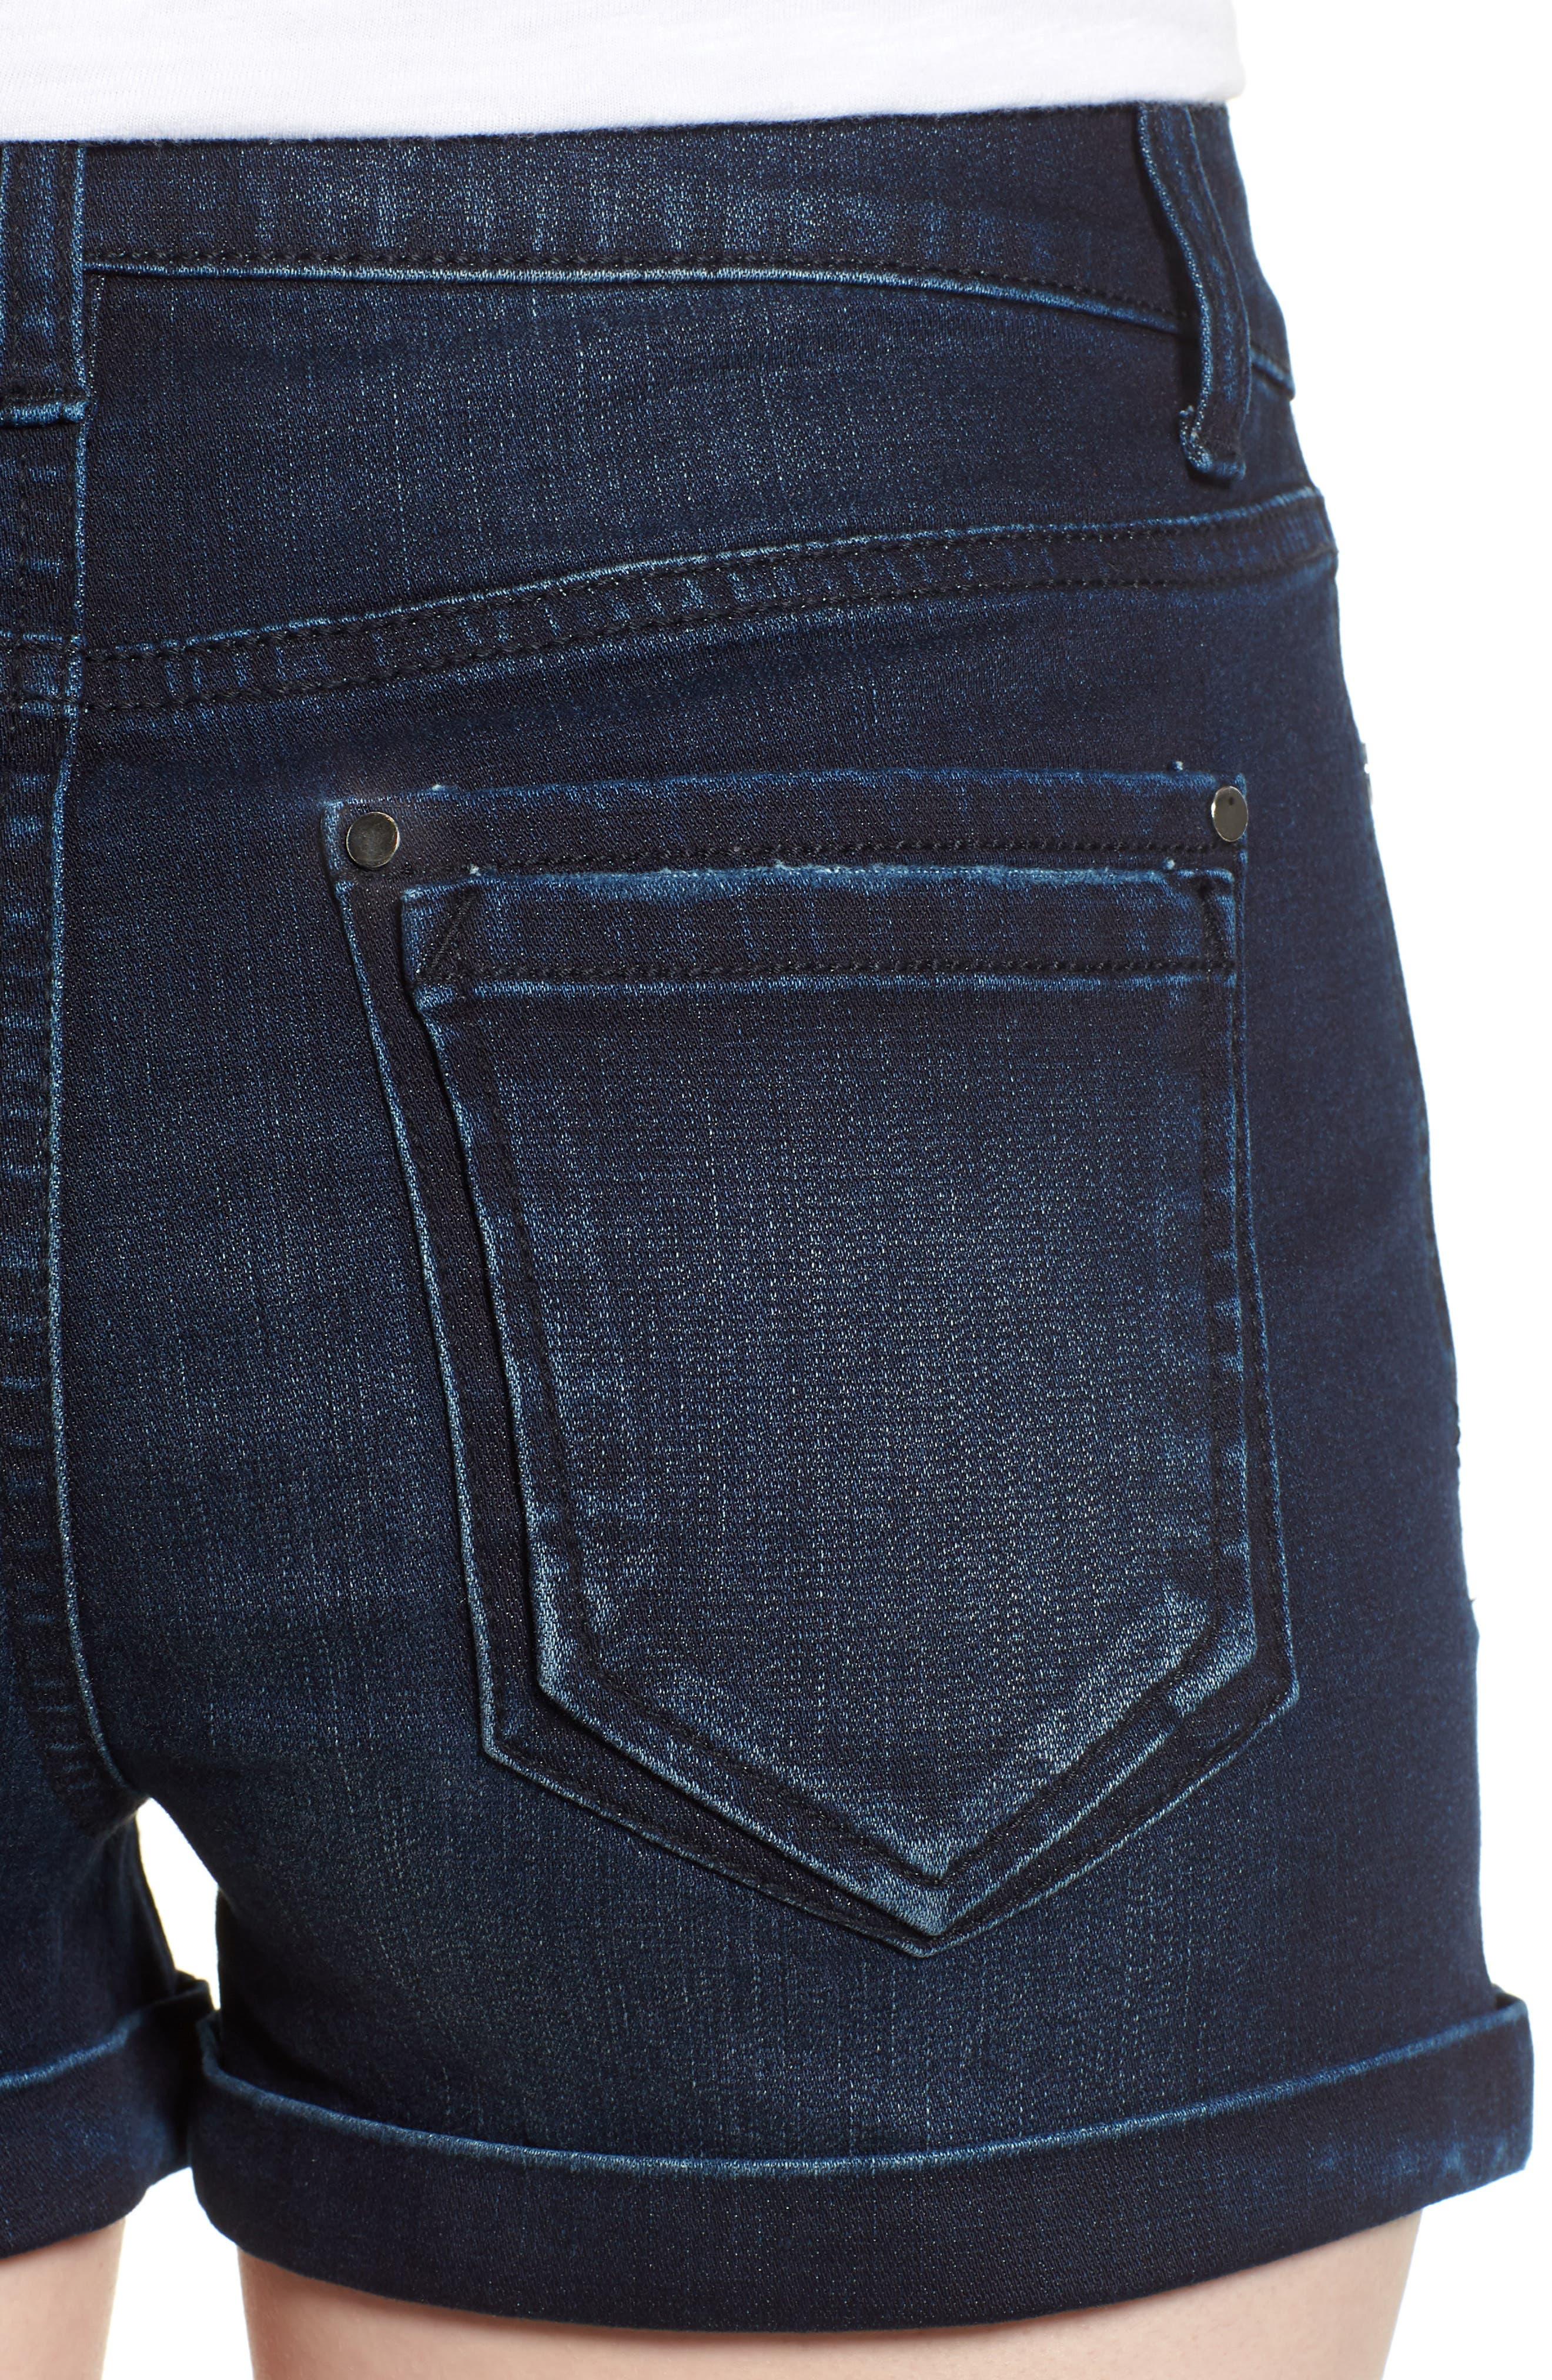 Cuffed Denim Shorts,                             Alternate thumbnail 4, color,                             Dark Wash